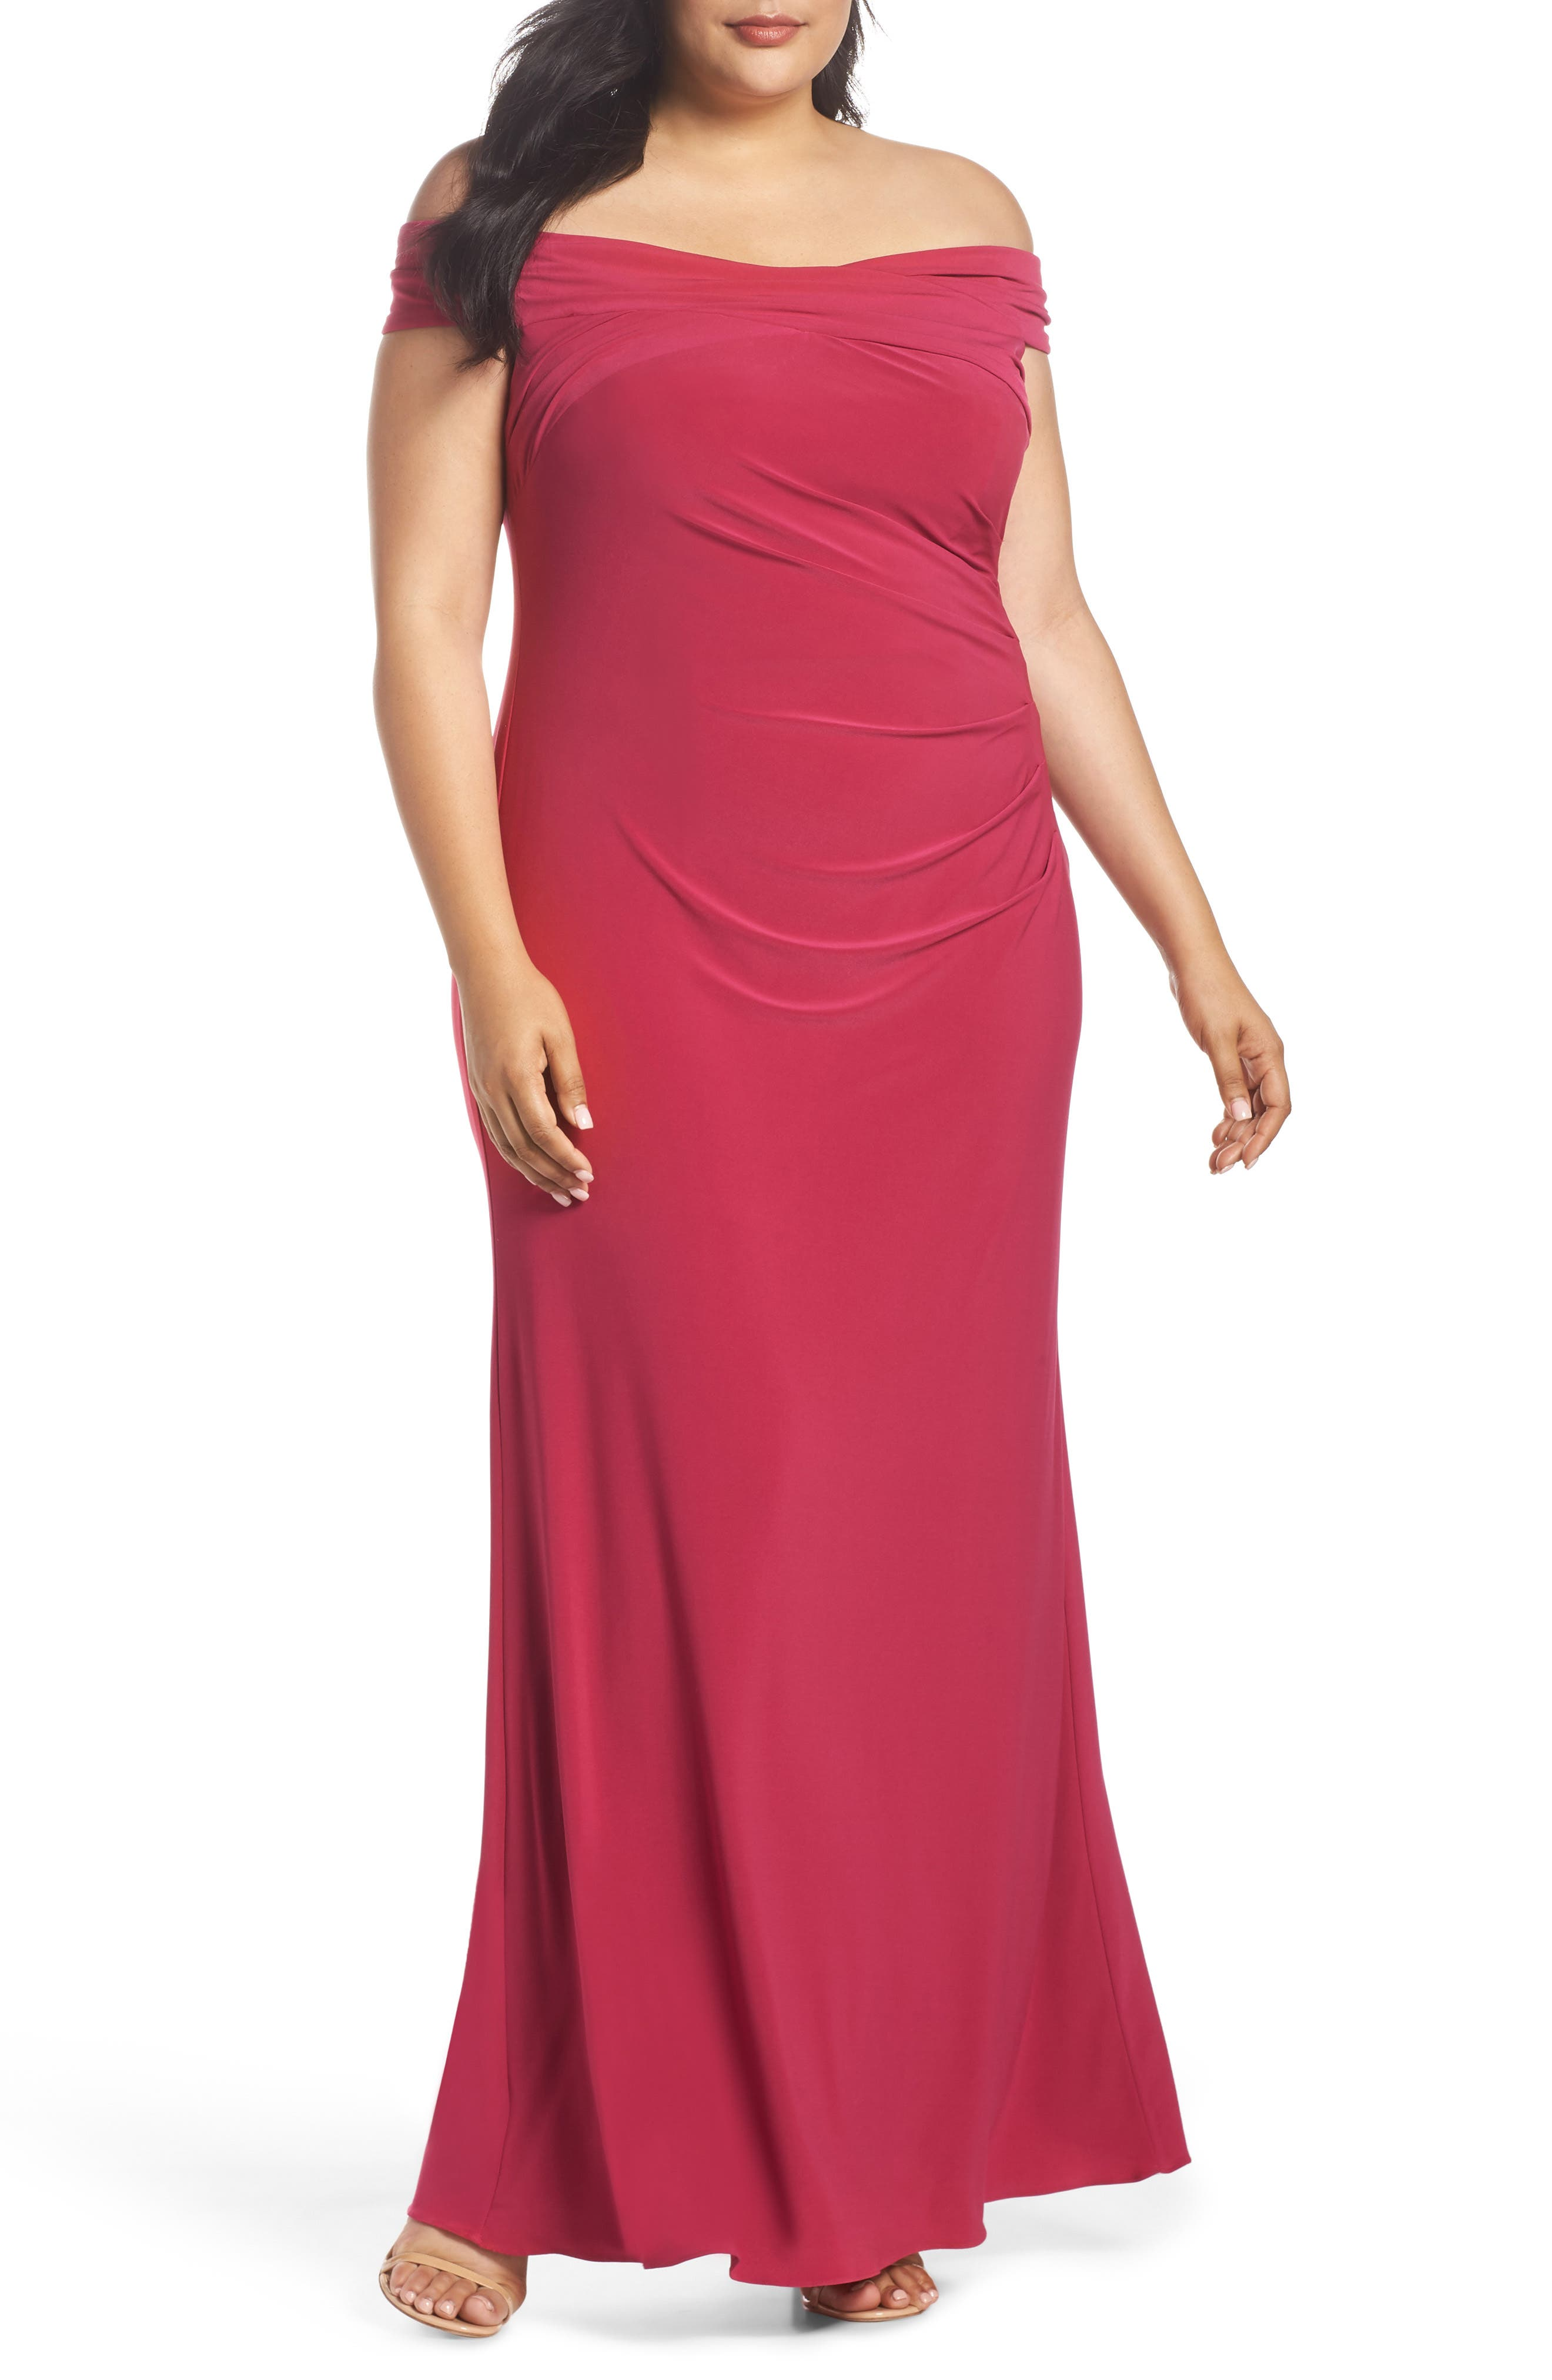 Off the Shoulder Jersey Dress,                             Main thumbnail 1, color,                             Bright Syrah